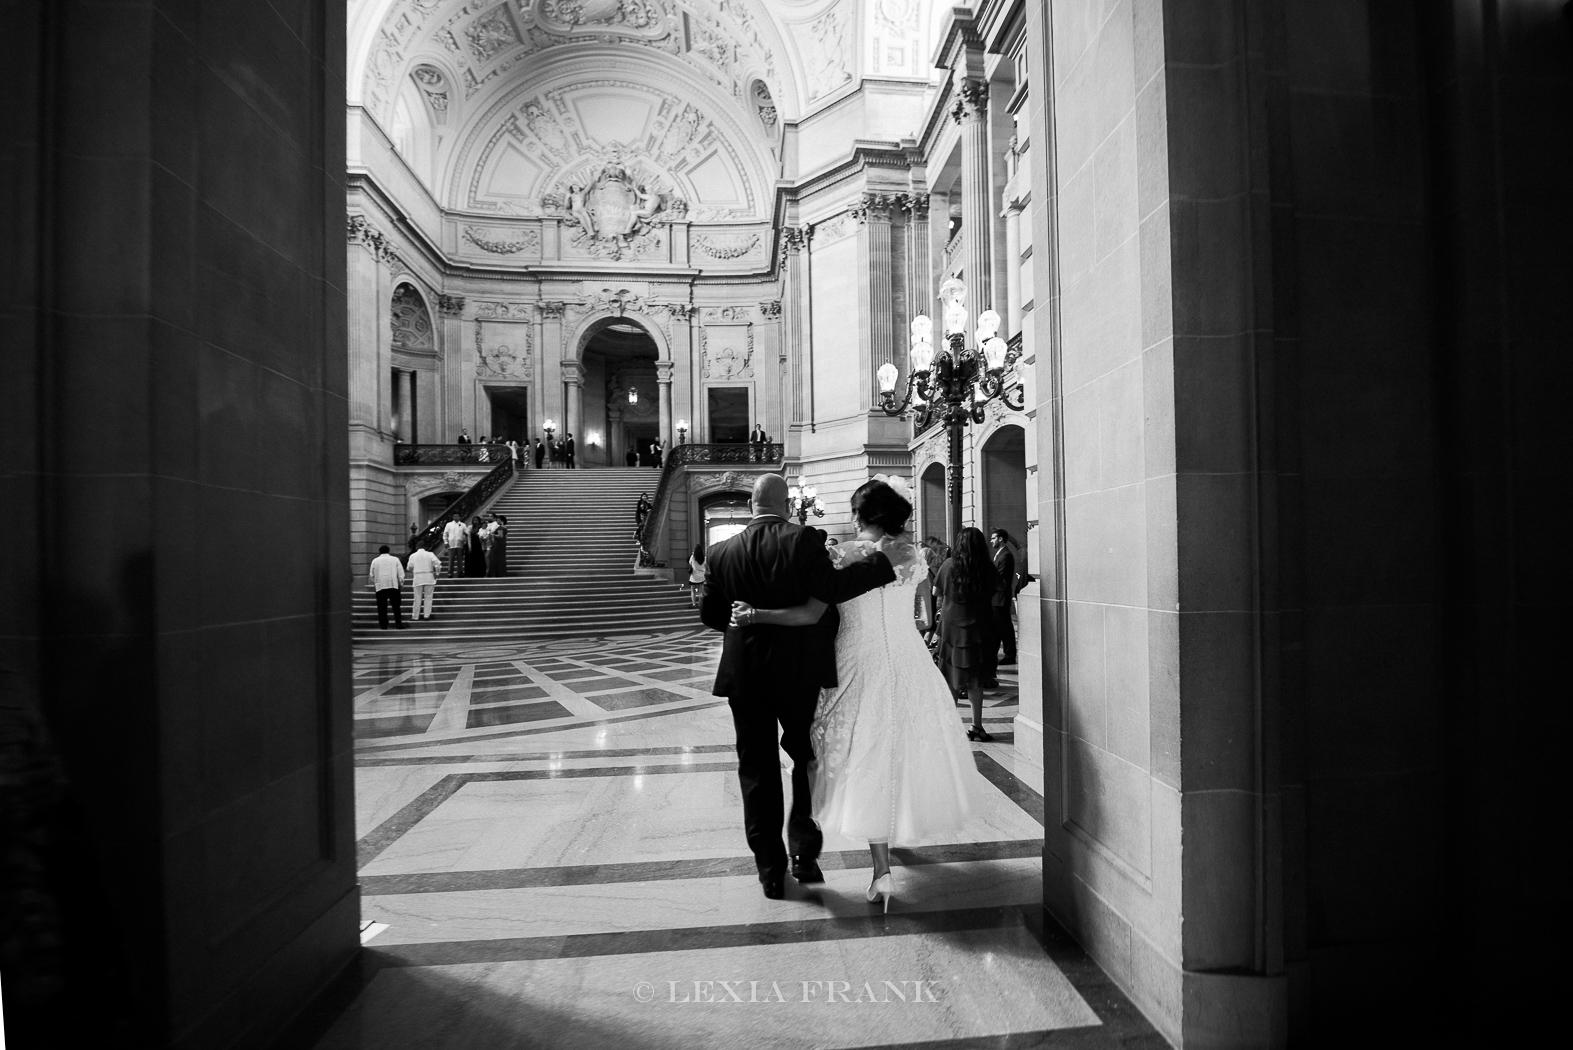 destination wedding photographer lexia frank - a portland oregon fine art film photographer - documents this San Francisco city hall wedding in film www.lexiafrank.com